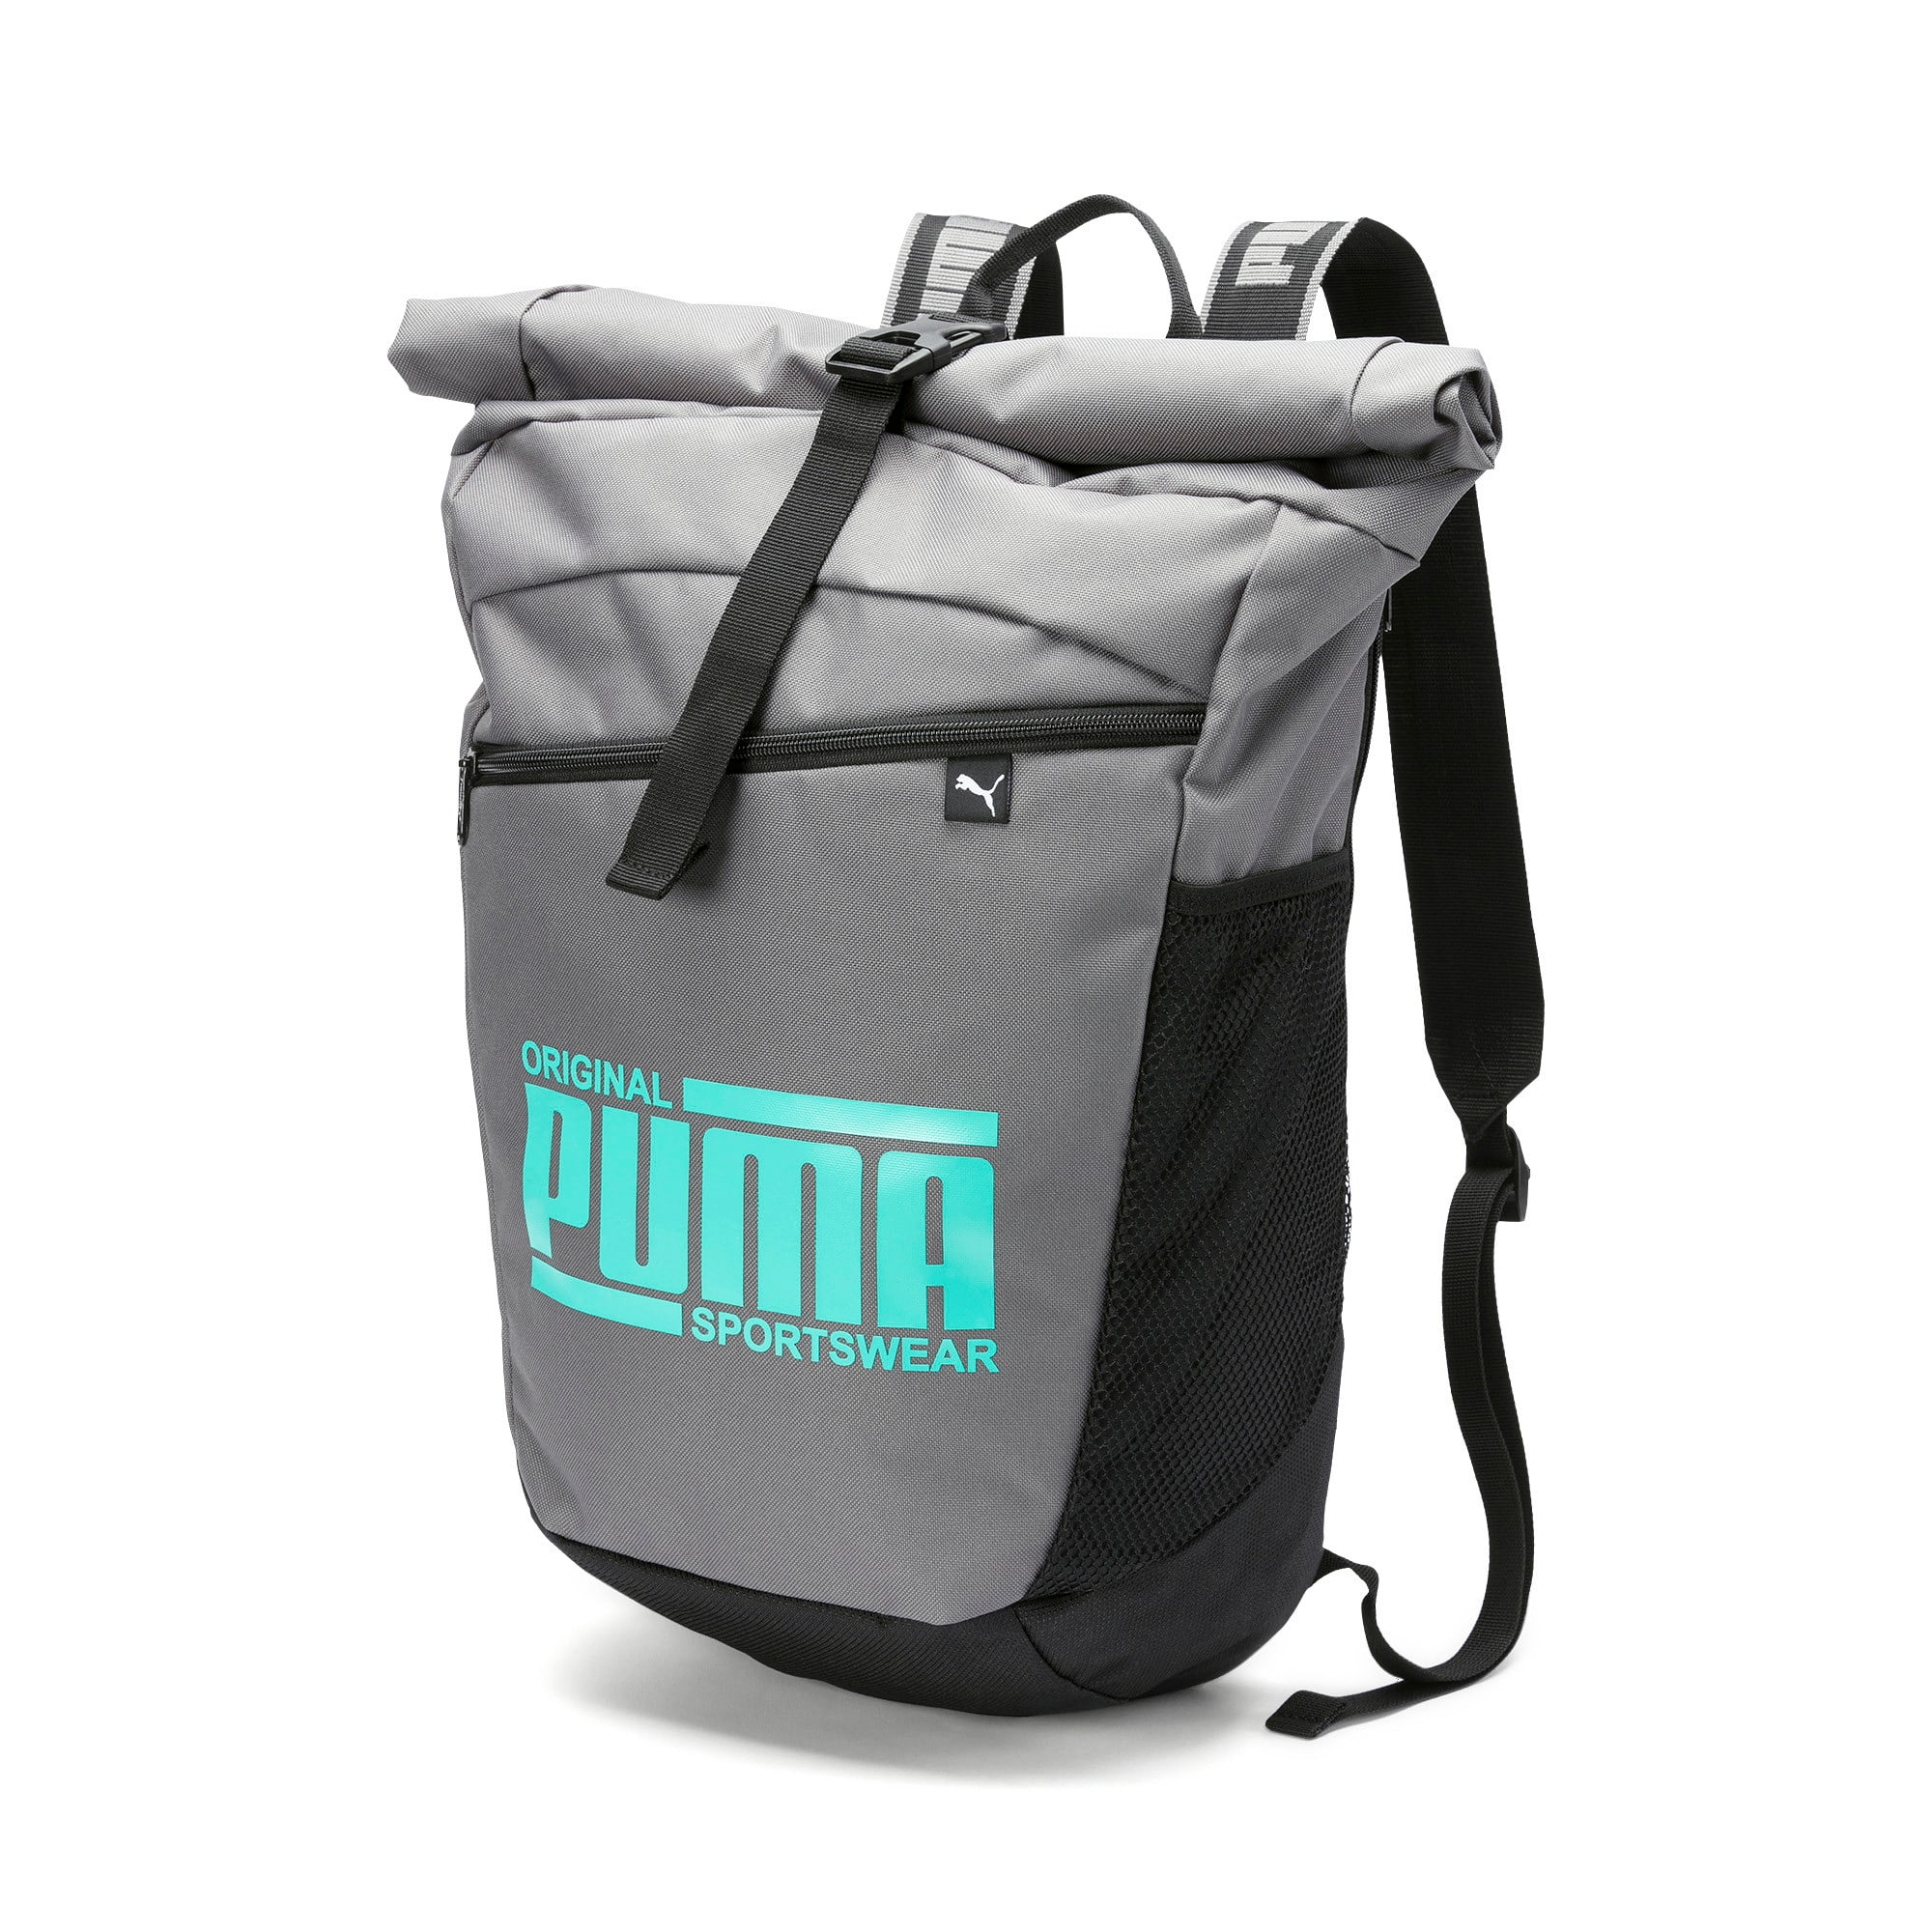 Thumbnail 1 of Sole Backpack, CASTLEROCK, medium-IND